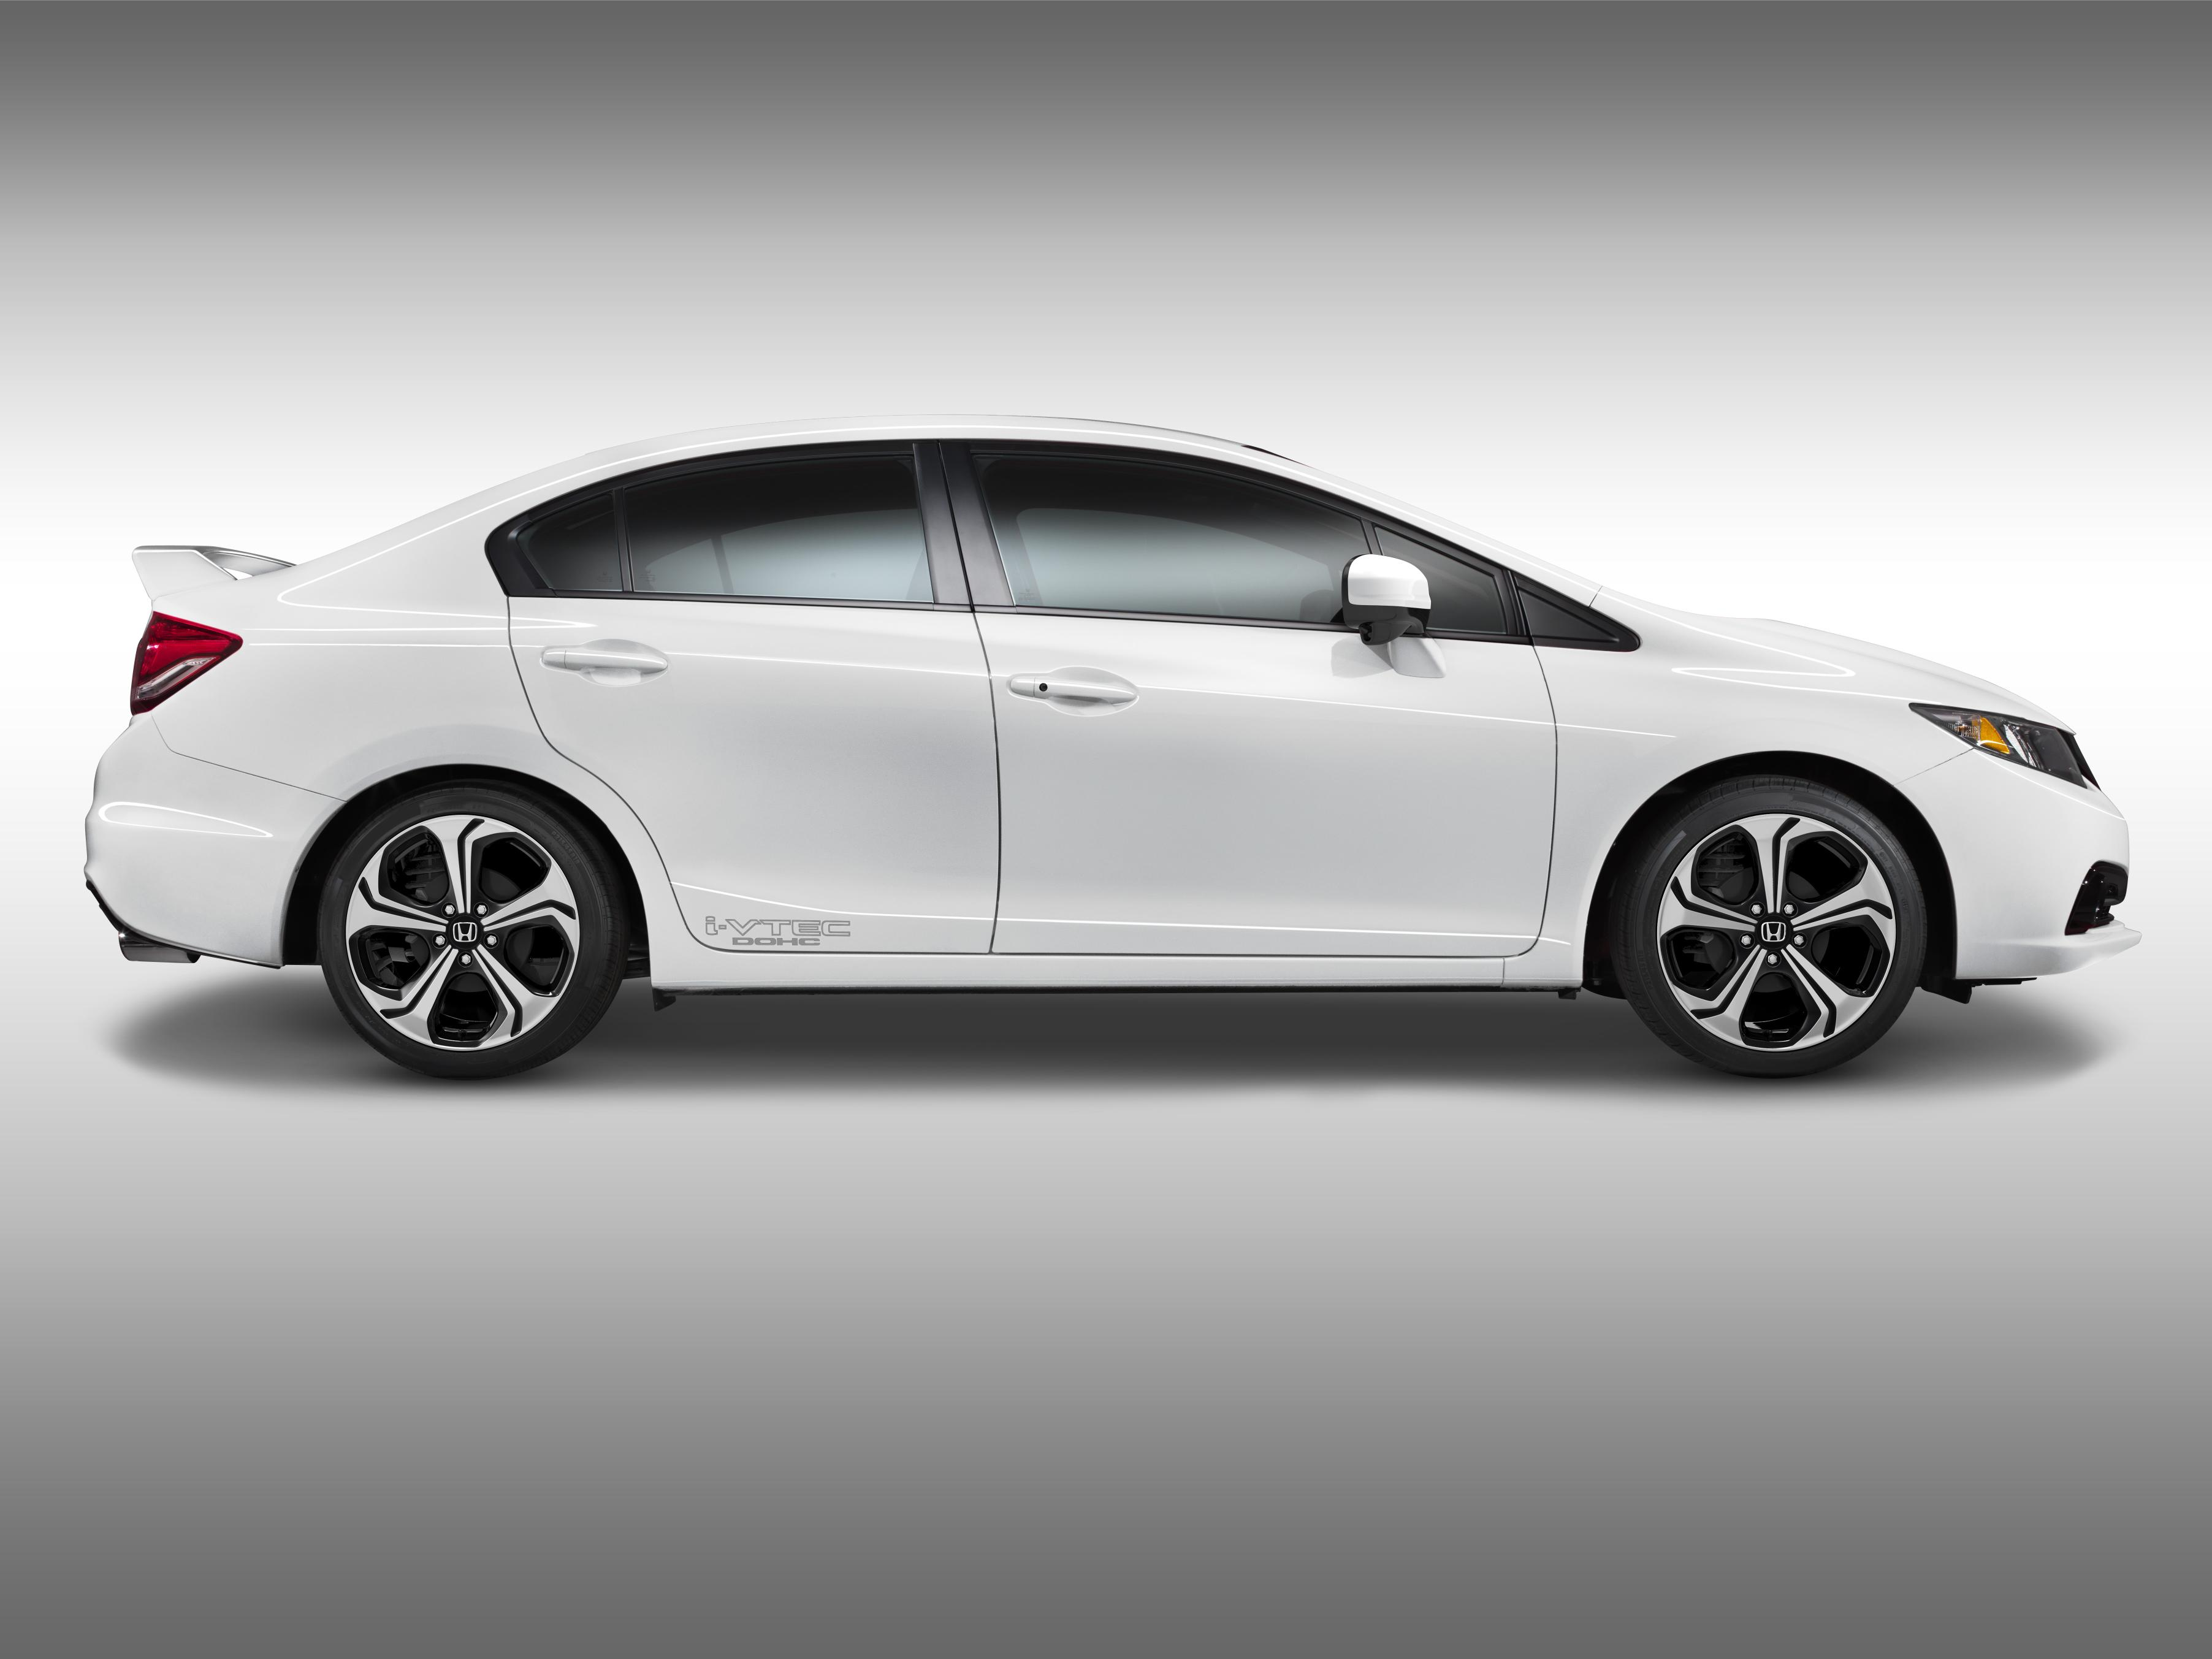 2015 Honda Civic Si is 100 More Than the 2014 Model  autoevolution